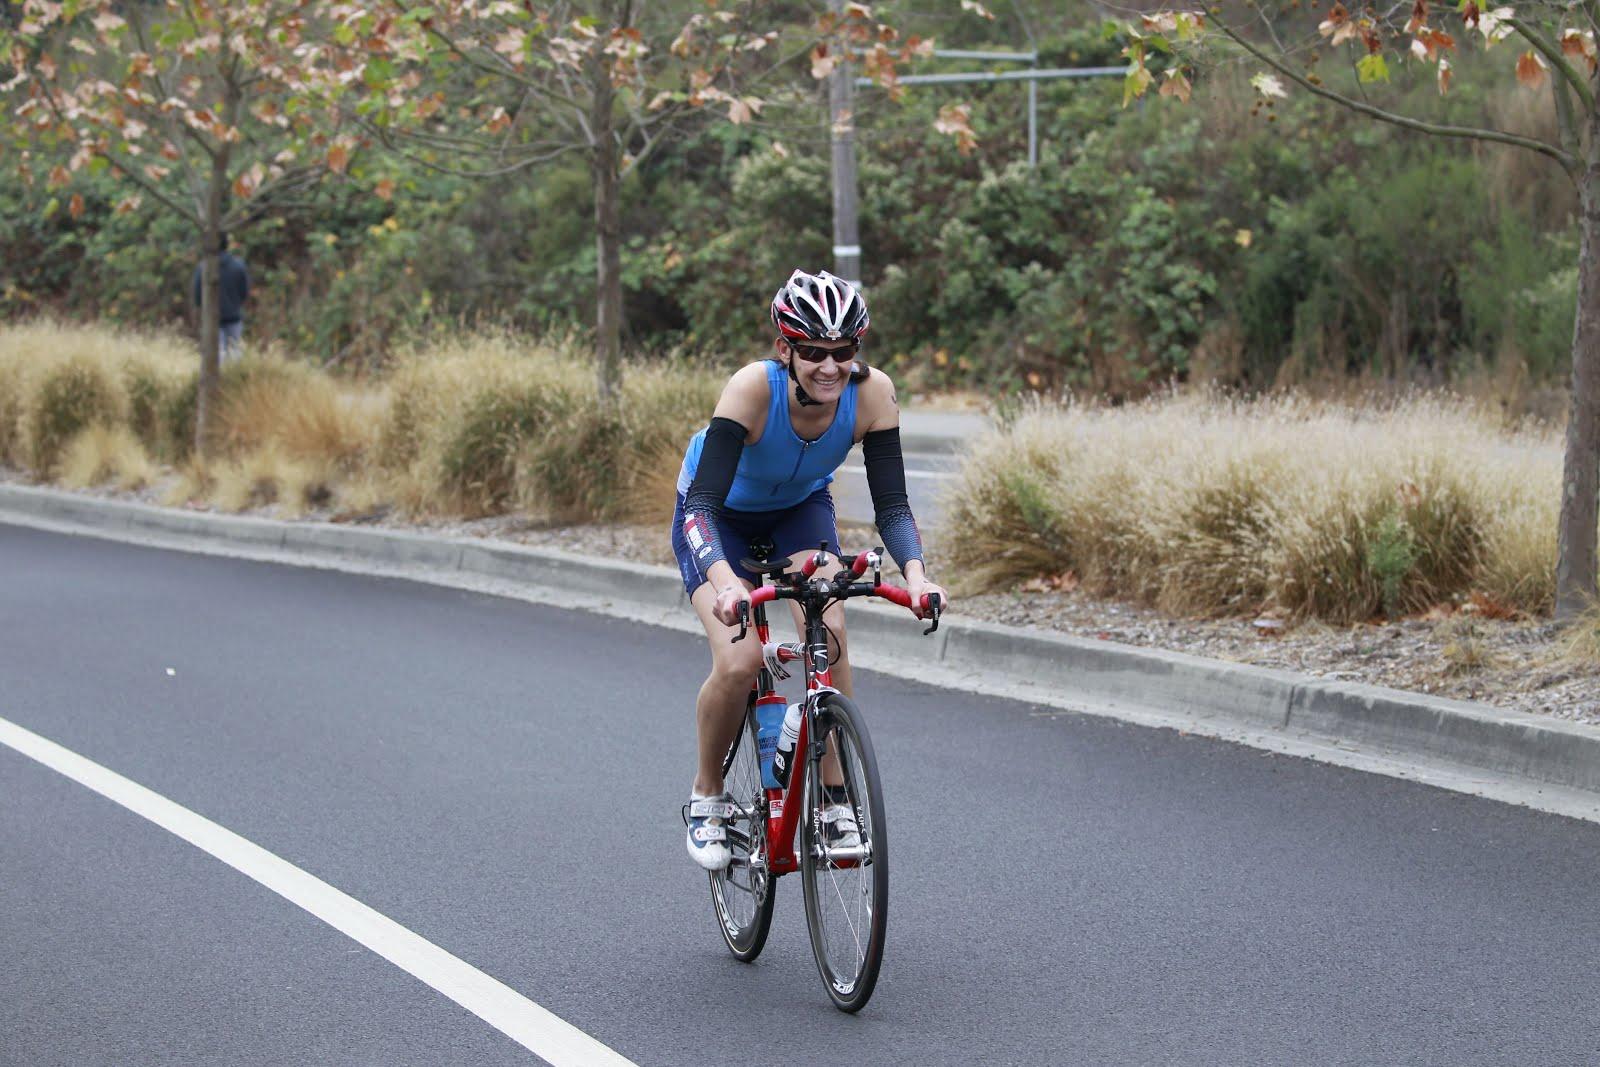 Diary of an amateur triathlete